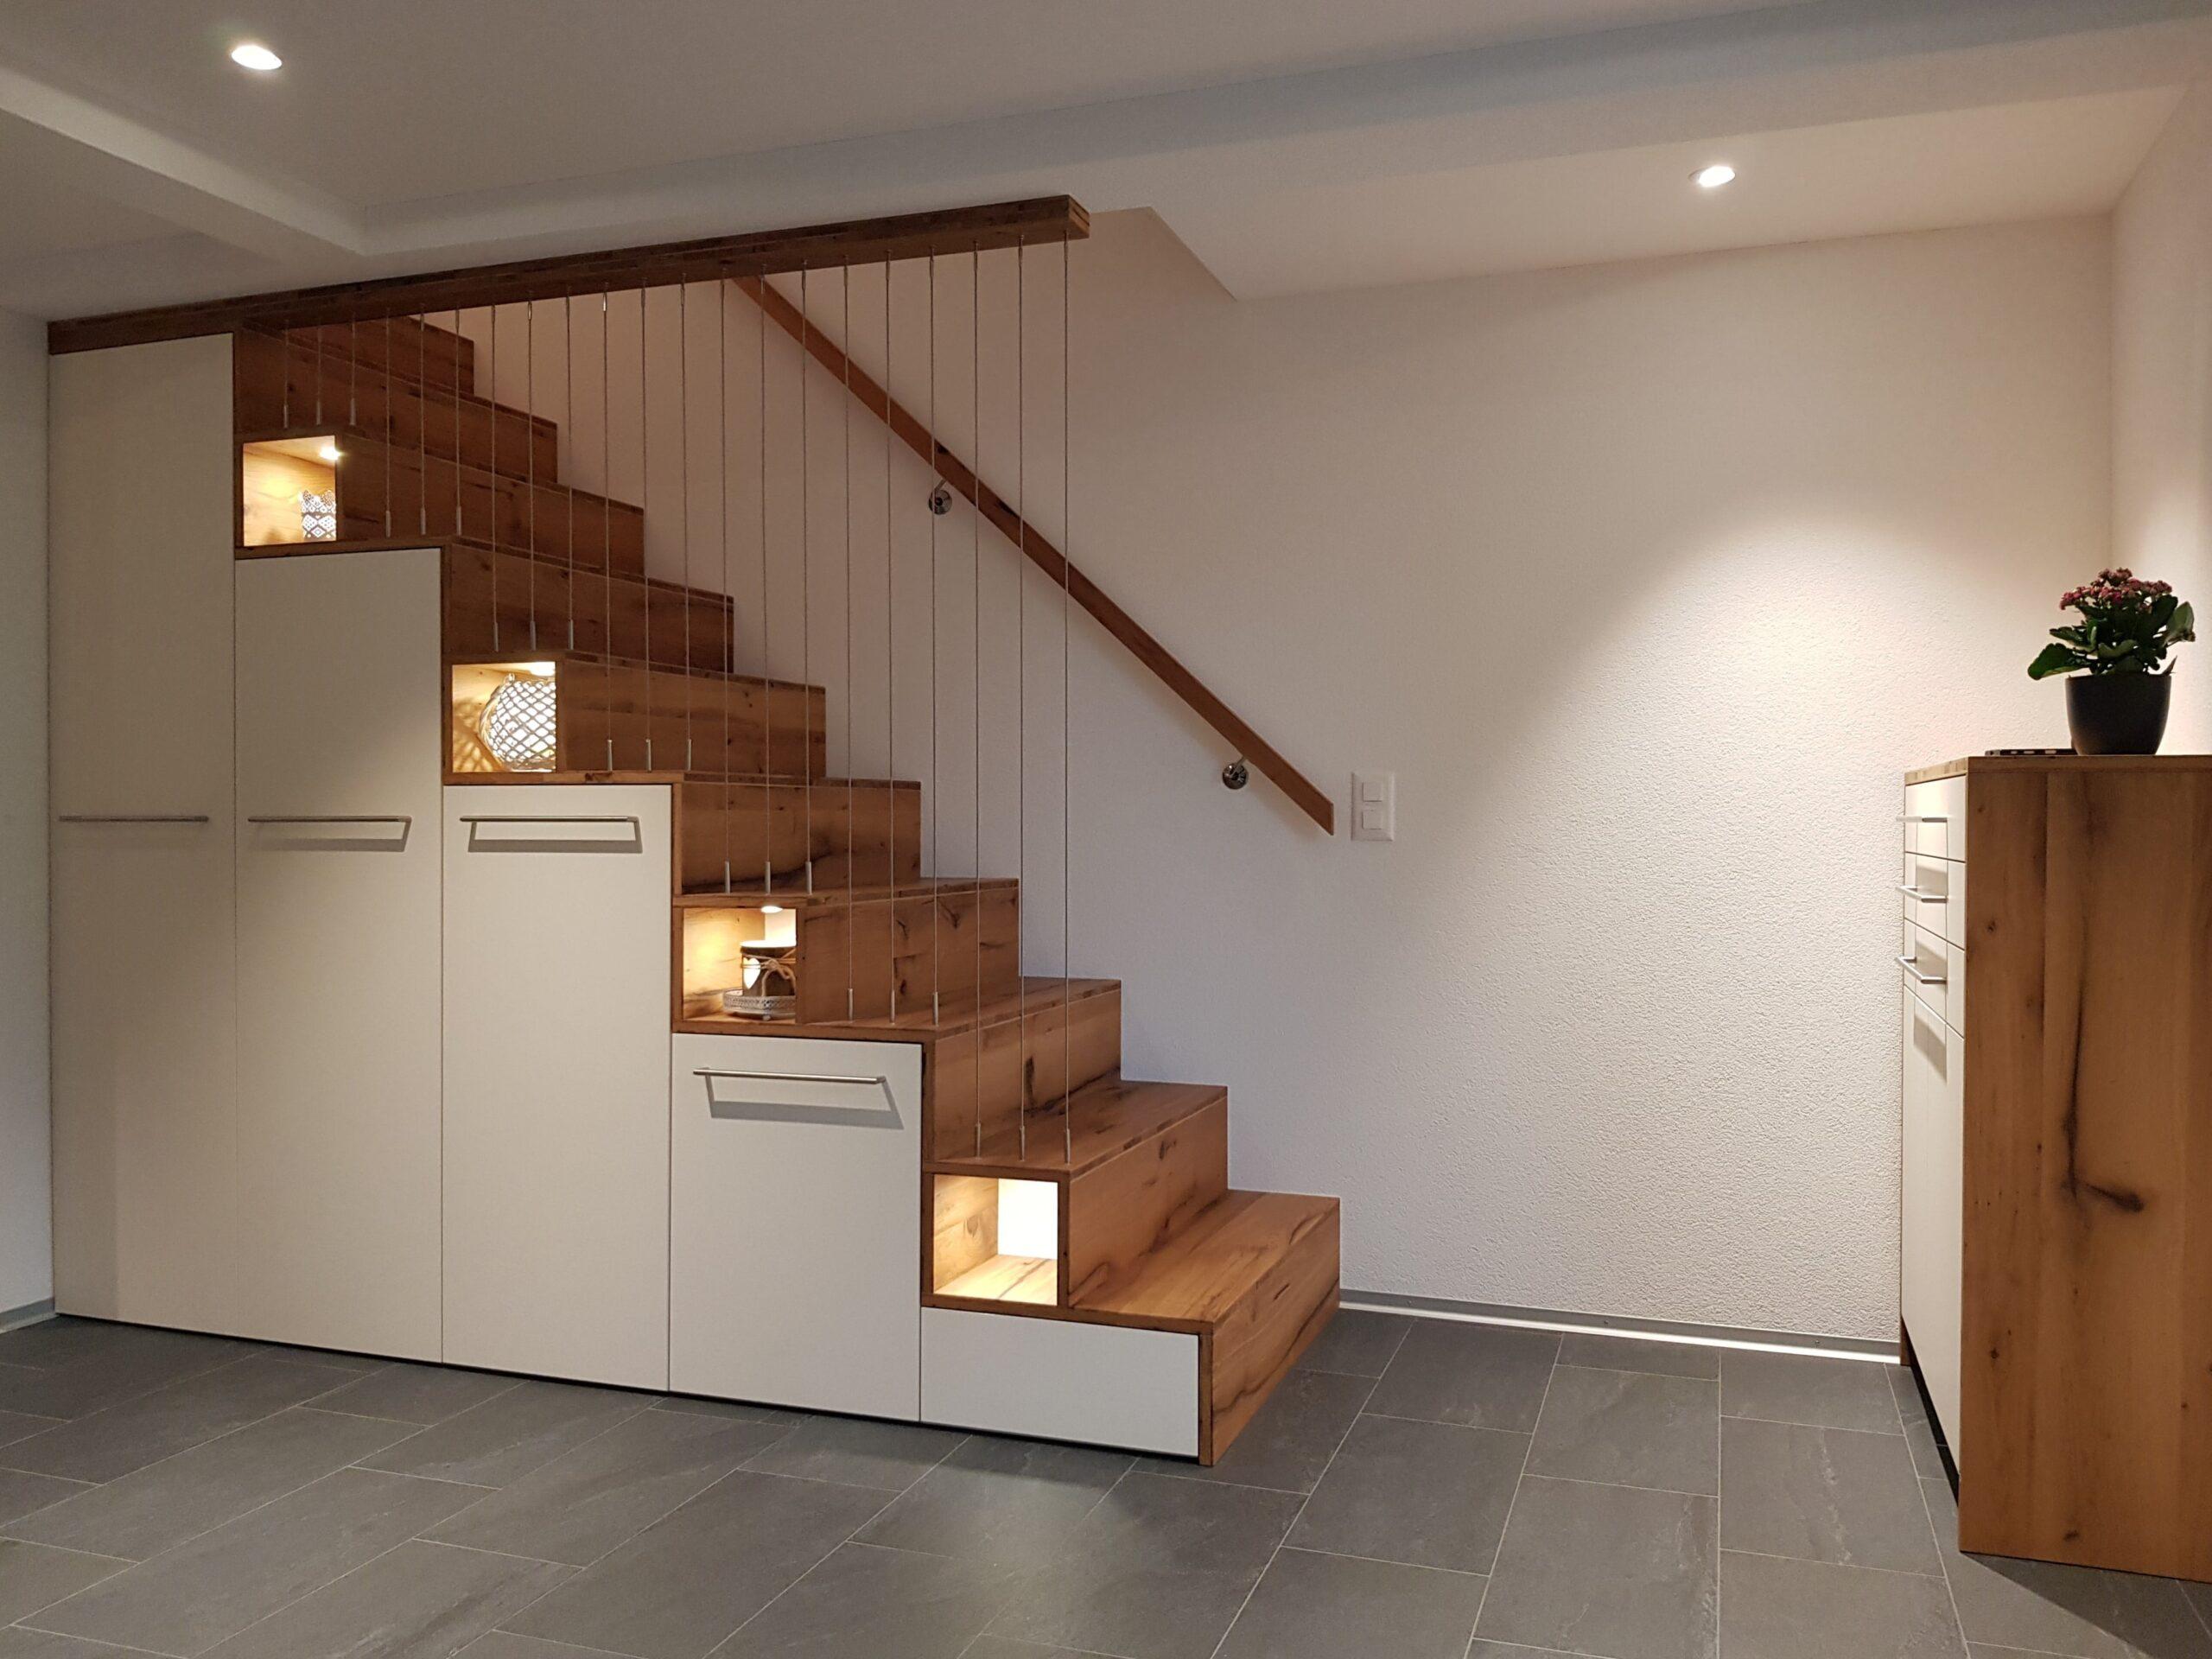 Wooddesign_Treppen_Teppengeländer_Holztreppen_Treppenverkleidung_Treppenmöbel (9)-min